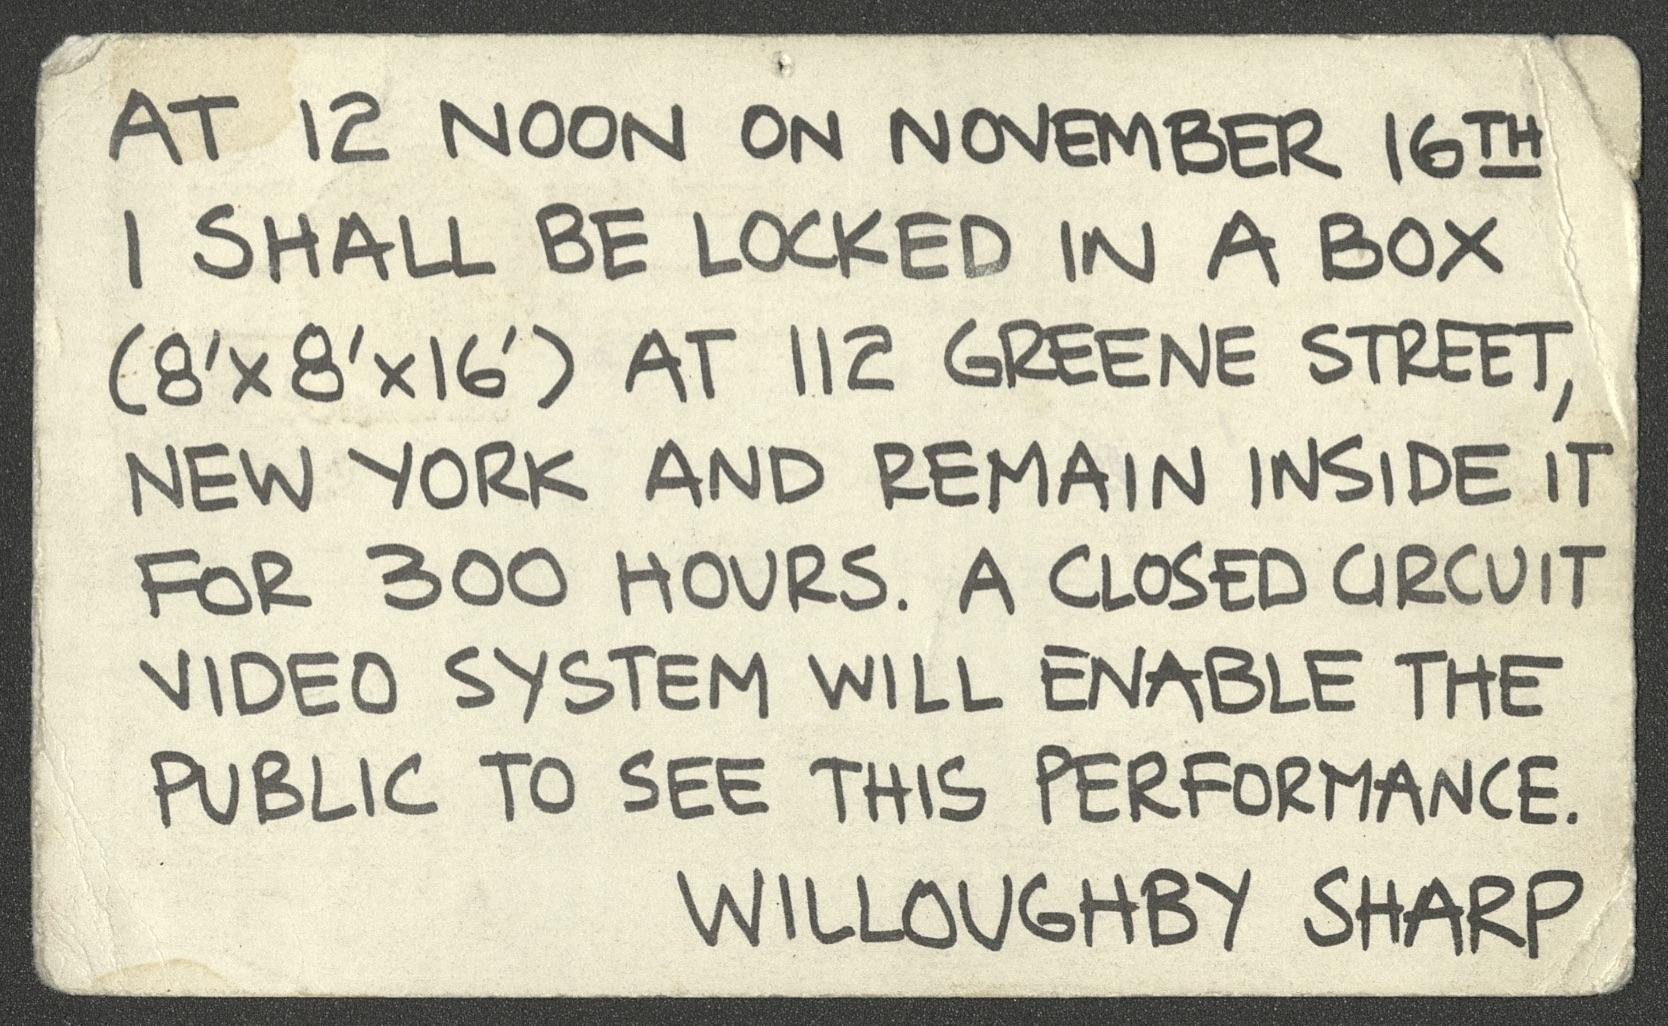 "Willoughby Sharp, Inside-Out, Video Performance, New York, Greene Street, 1974 (invitation)Galerie Stampa / Kunsthalle Basel, Coop Himmelb(l)au ""Contact"", 1971 (Announcement); Archiv der Avantgarden, Staatliche Kunstsammlungen Dresden"